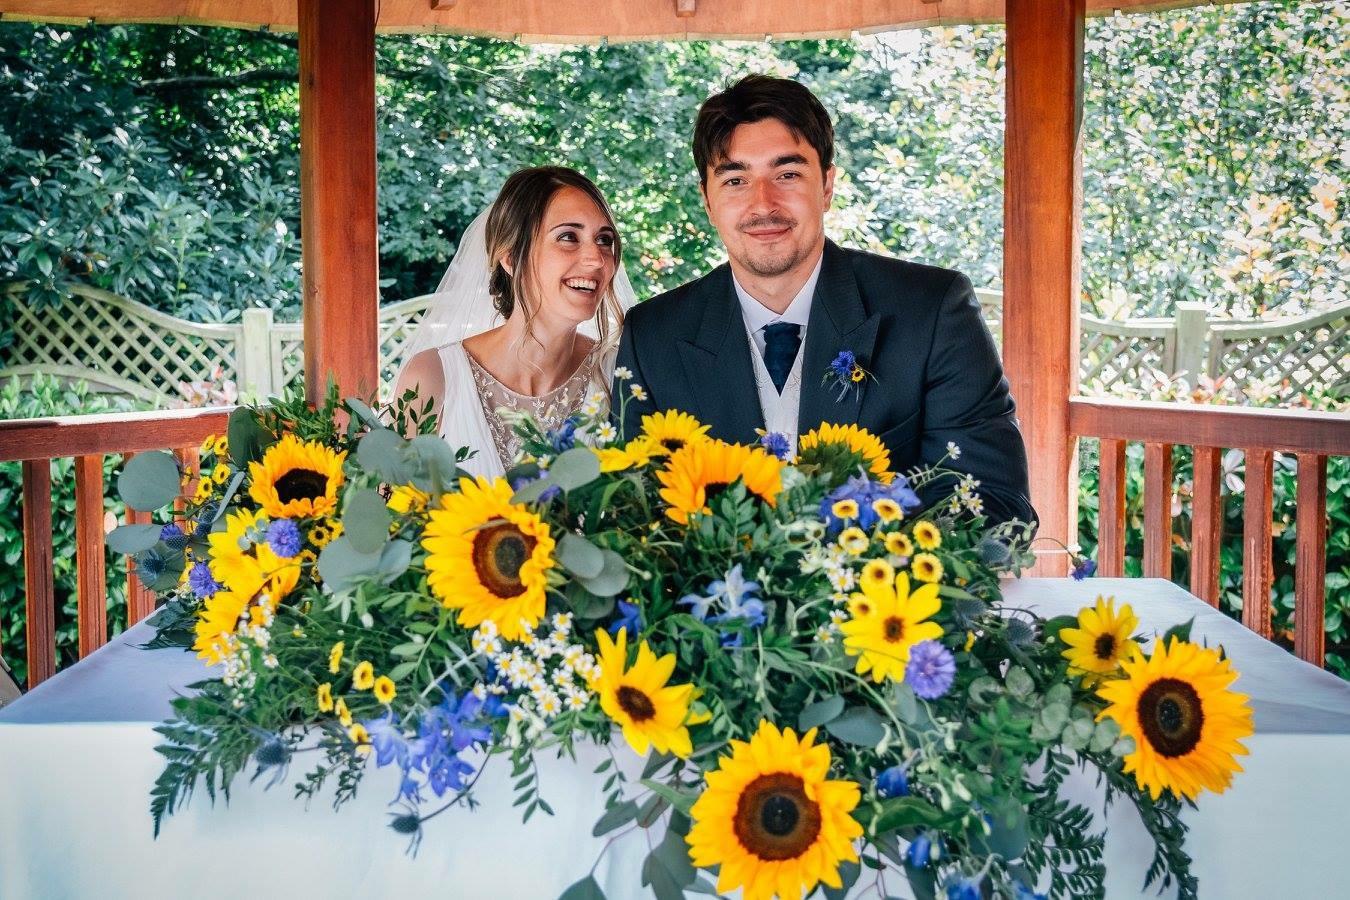 Natural-Wedding-Webb-and-Farrer-Brighton-Flowers (4).JPG